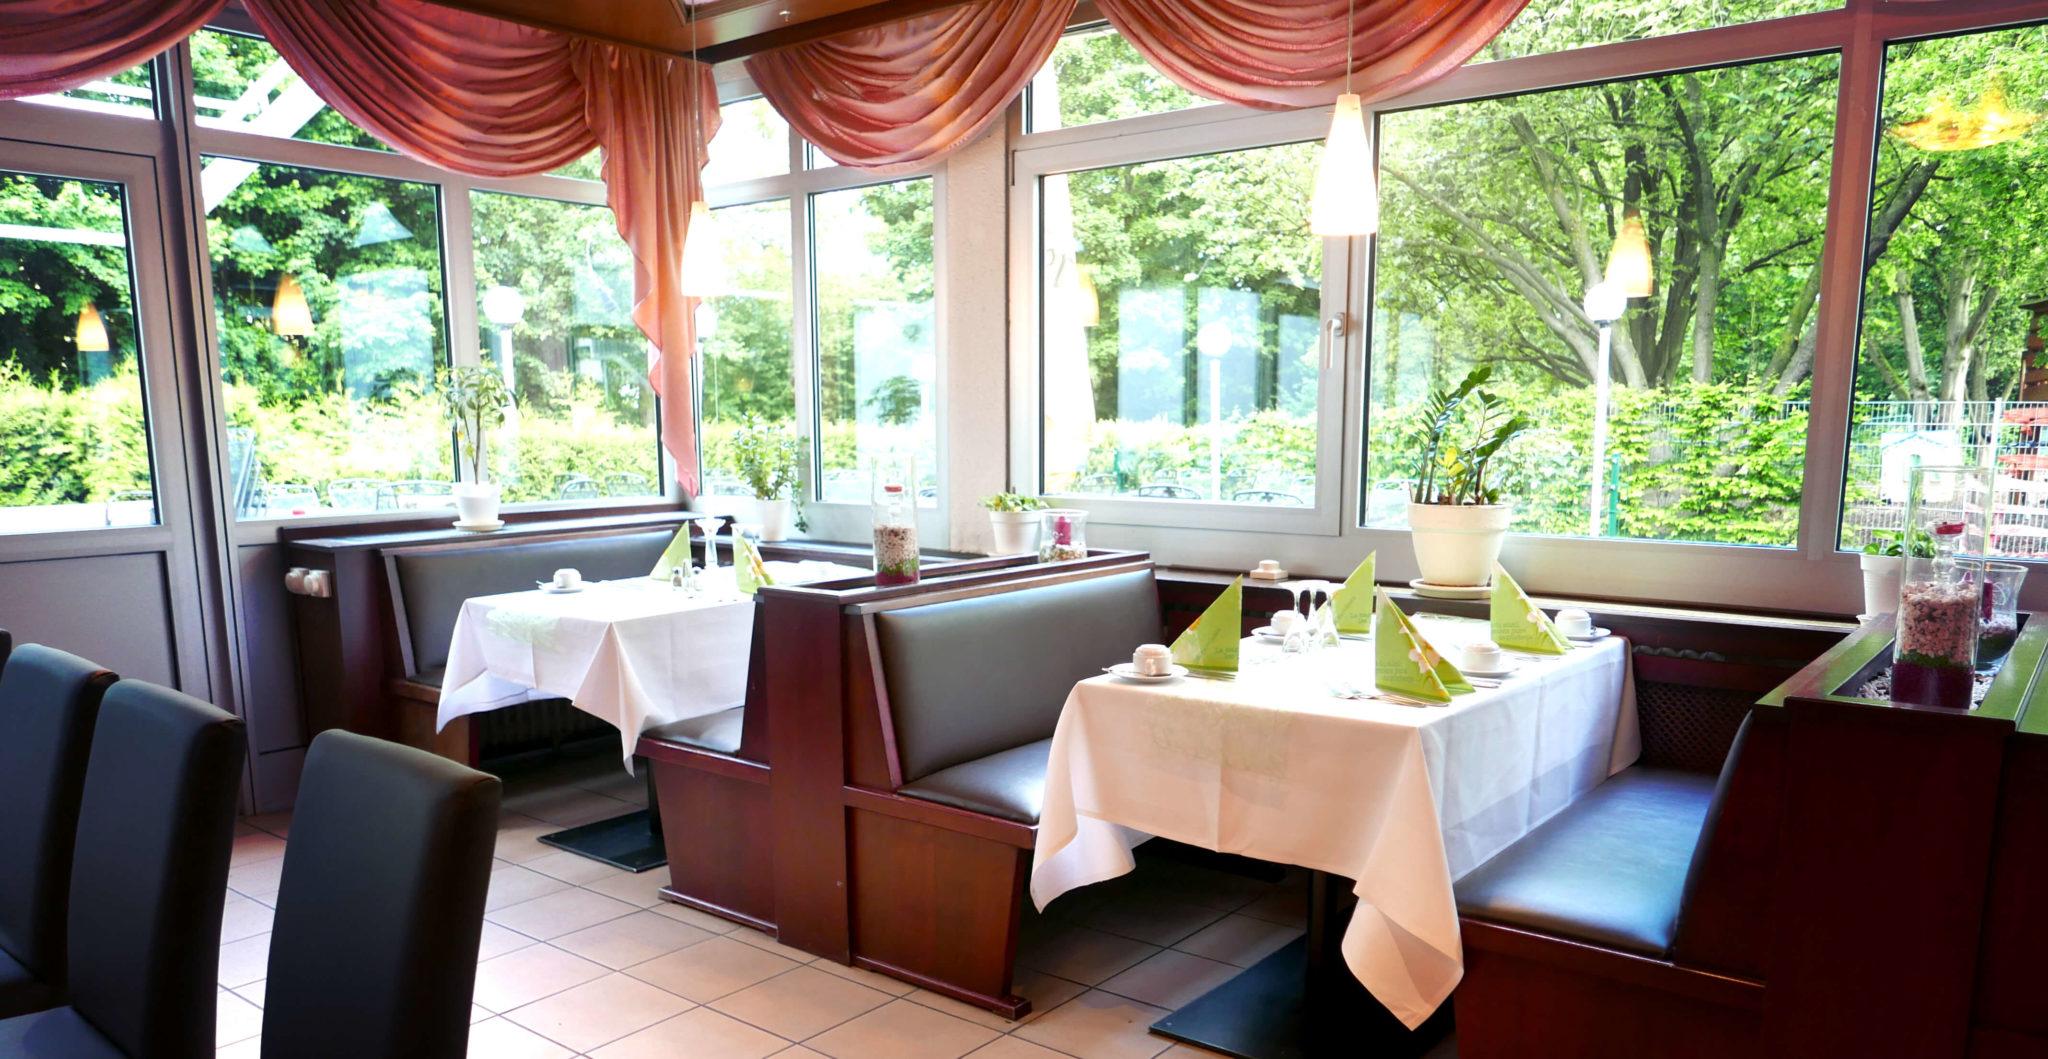 Restaurant Perle Bürgerhaus Harheim